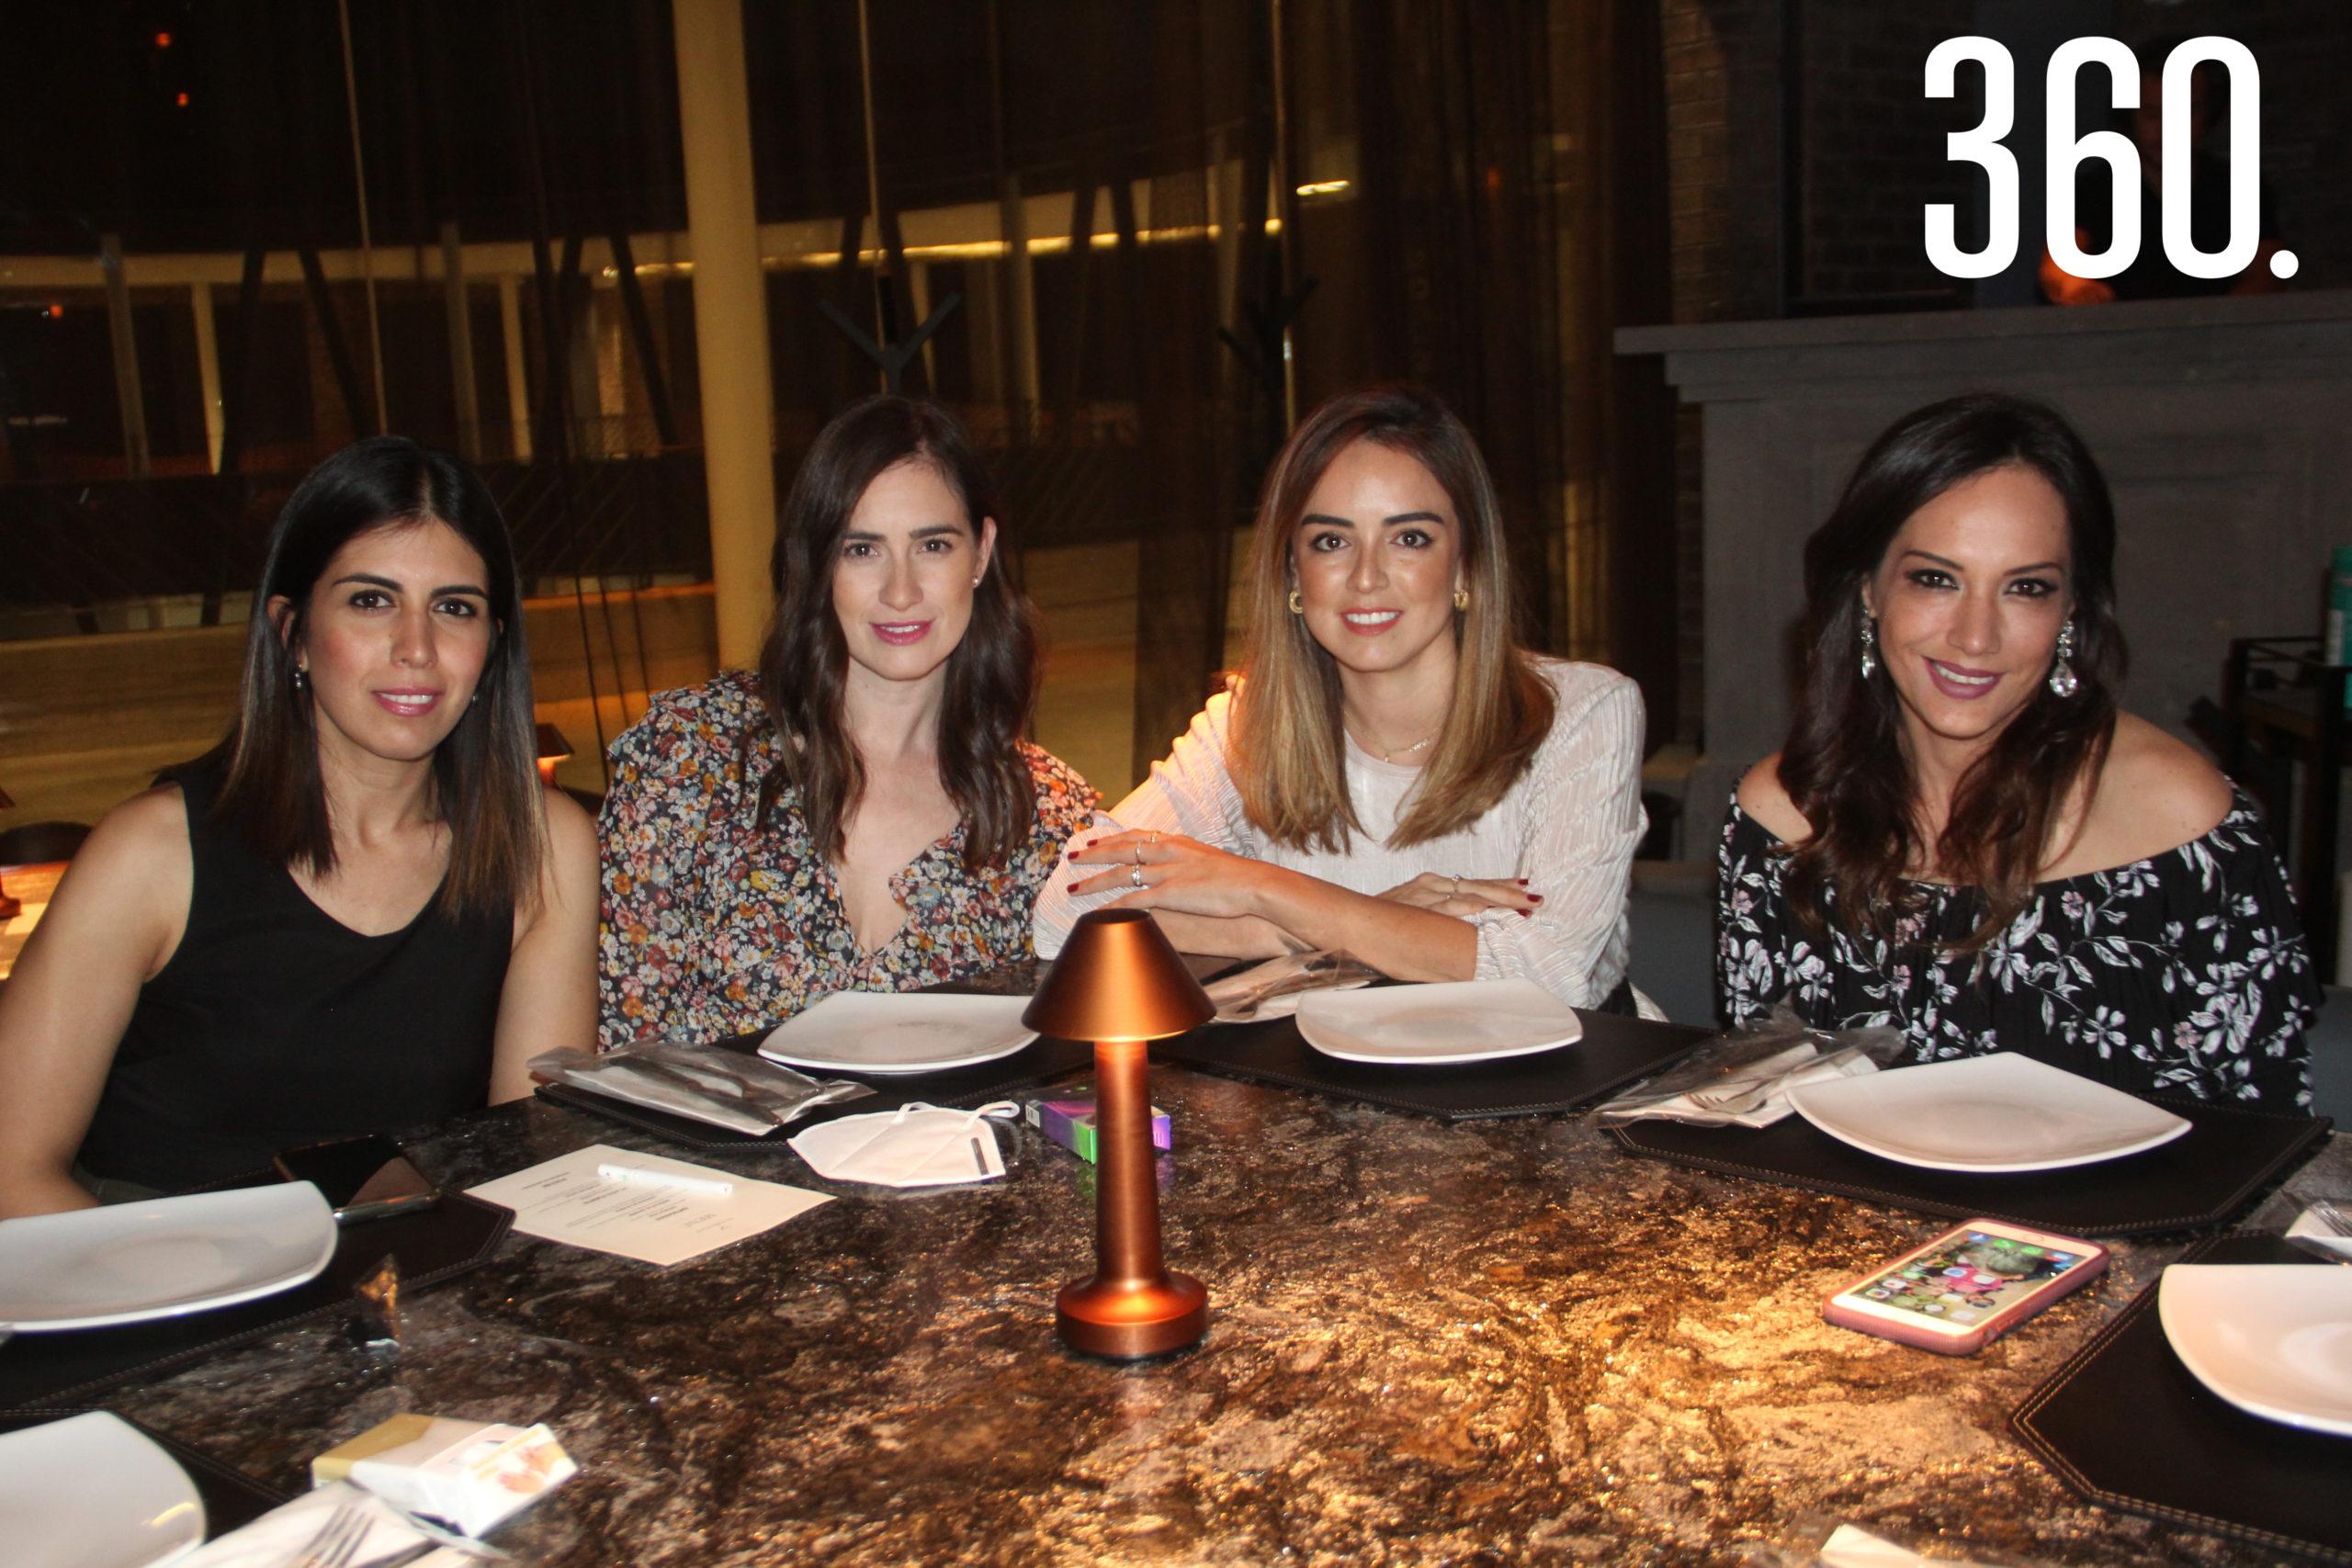 Marisol Méndez, Melina Rivera, Diana Gutiérrez y Cristina Aguirre.